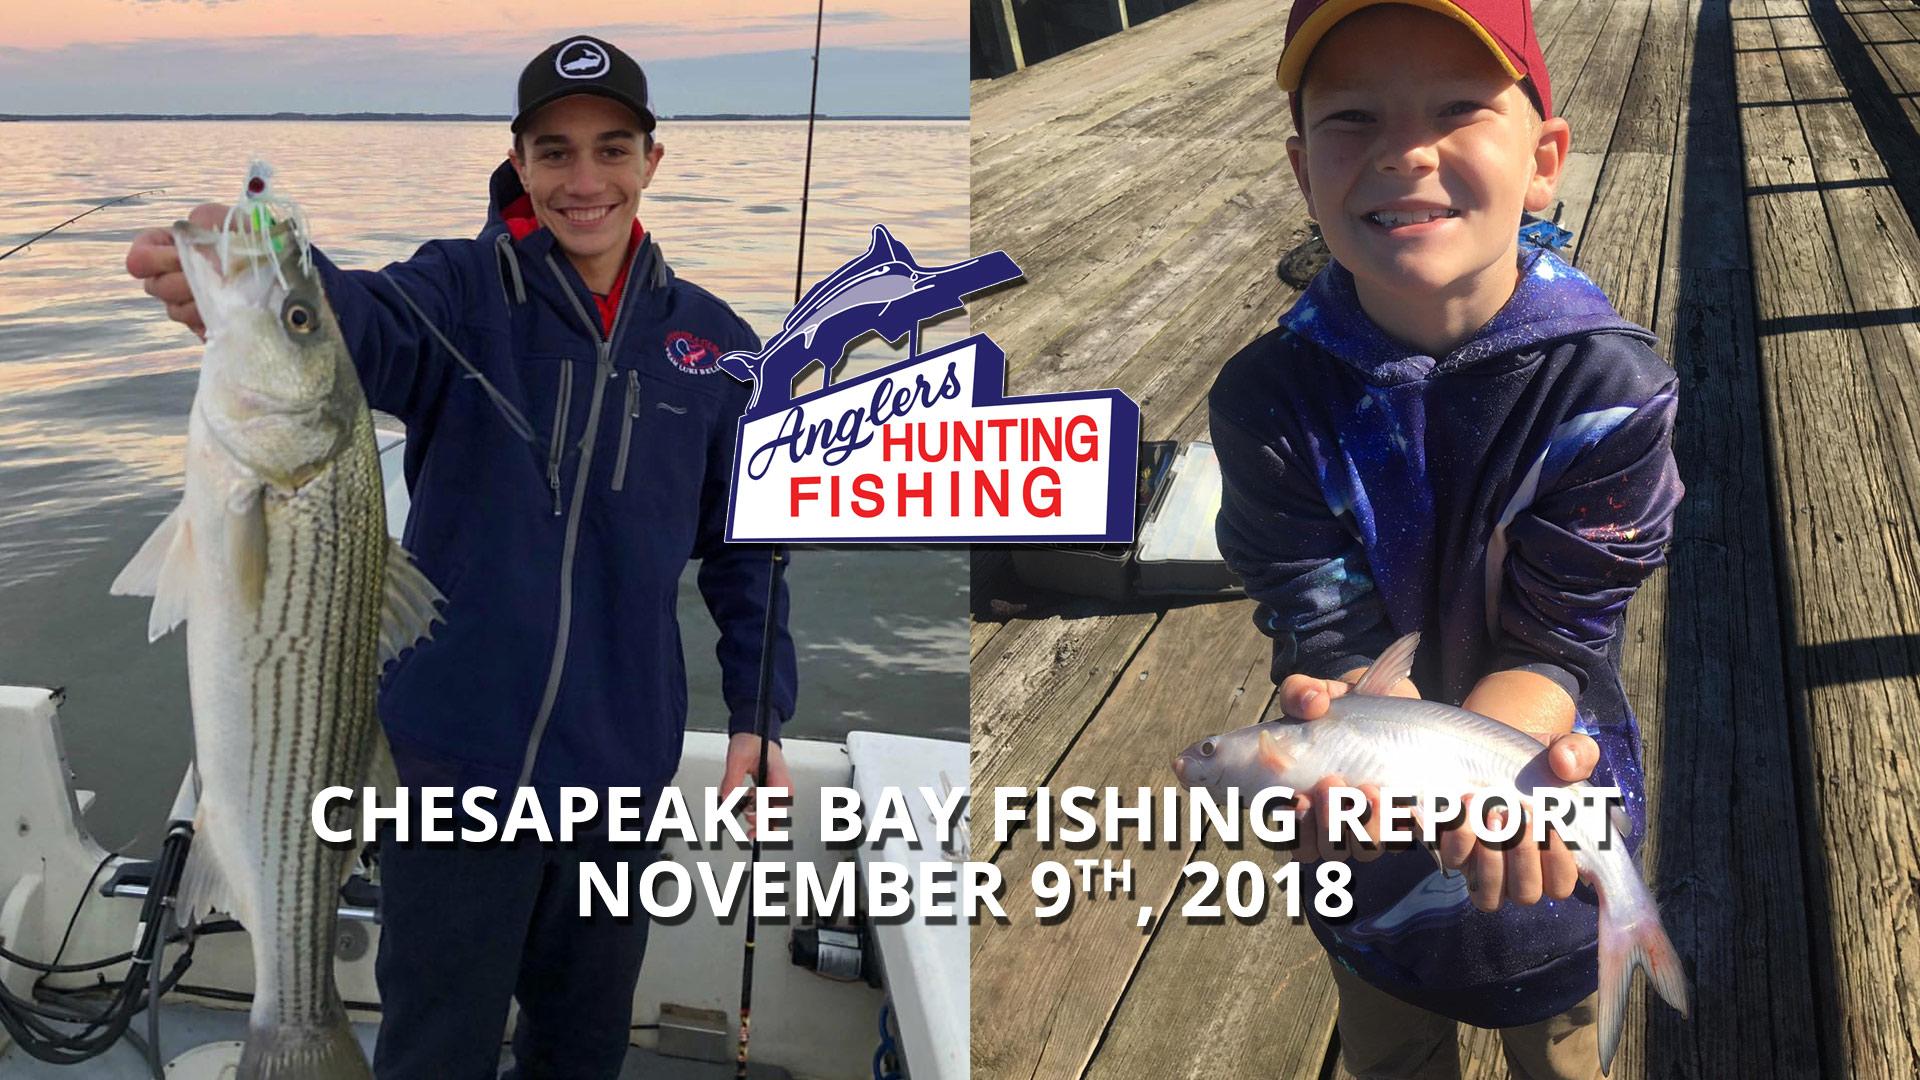 Chesapeake Bay Fishing Report - November 9th, 2018